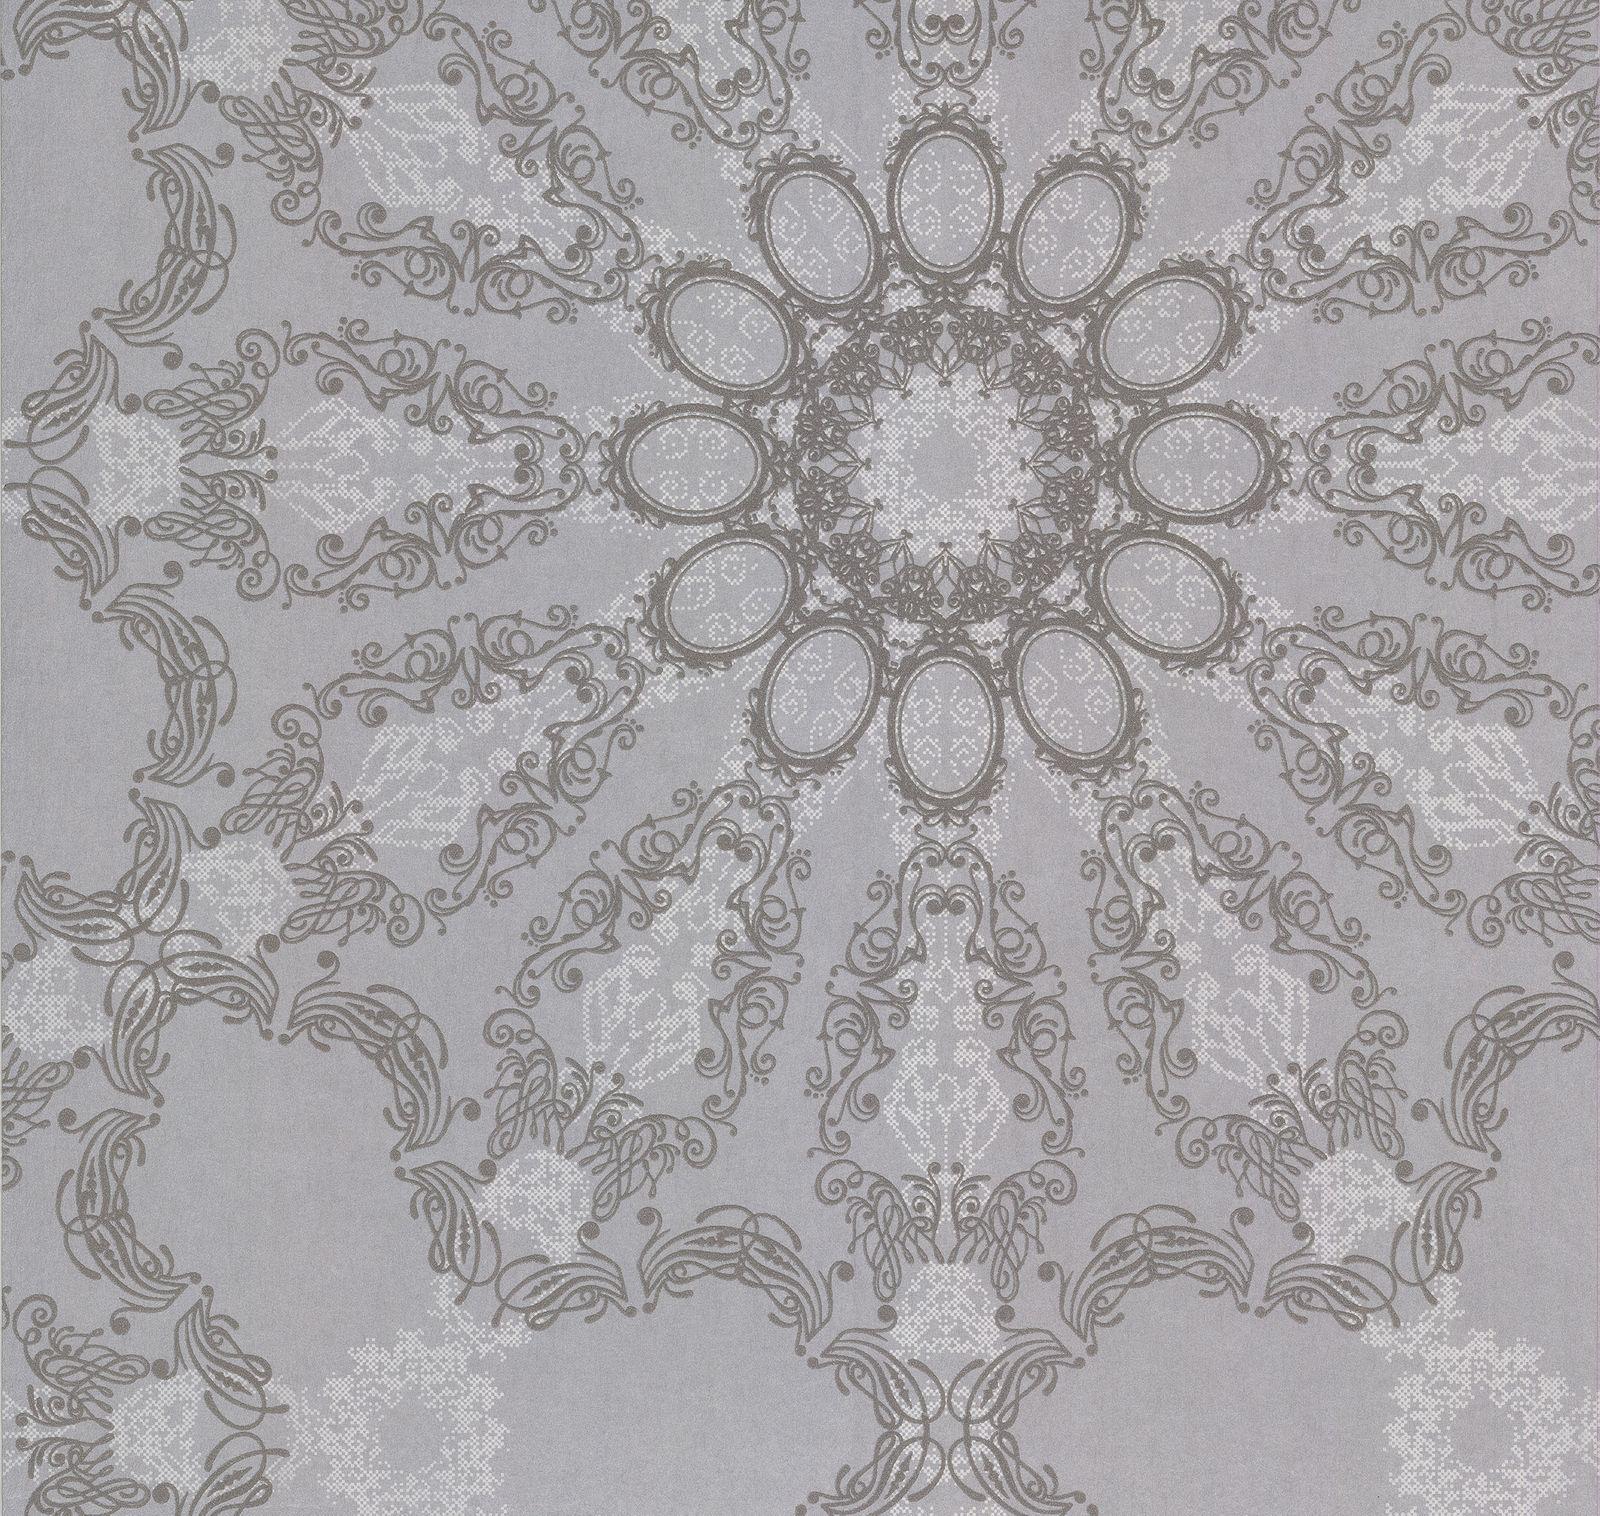 Kretschmer Tapete Mandala Silber Grau Glitzer 41007-20